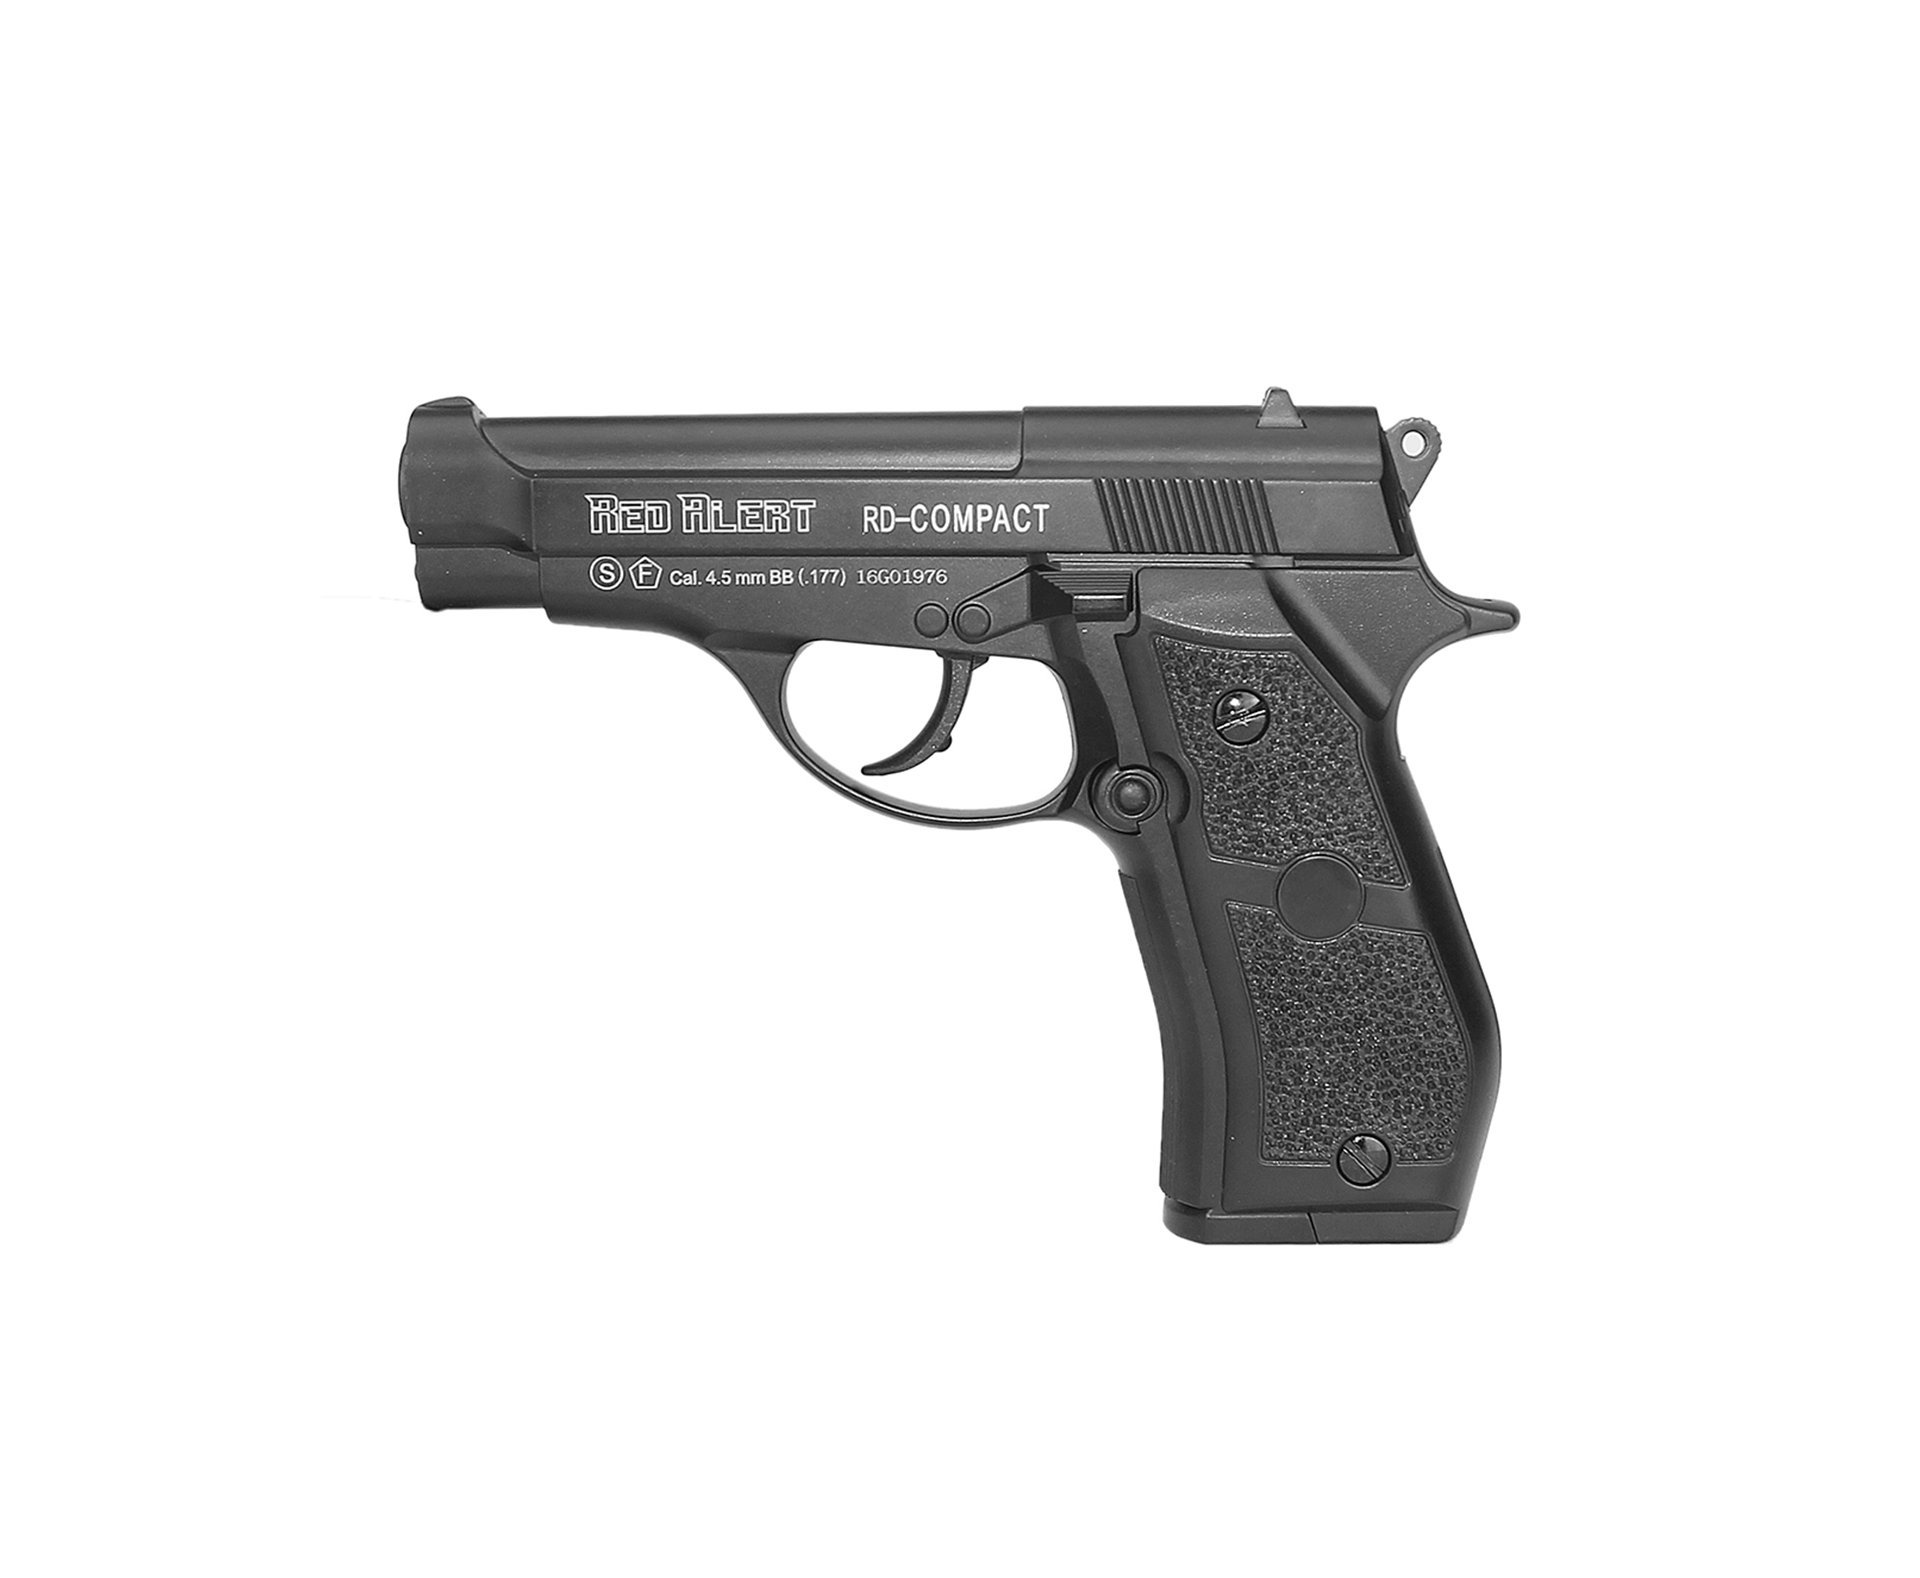 Pistola De Pressão A Gás Co2 Rd-compact Full Metal Black 4.5mm - Red Alert